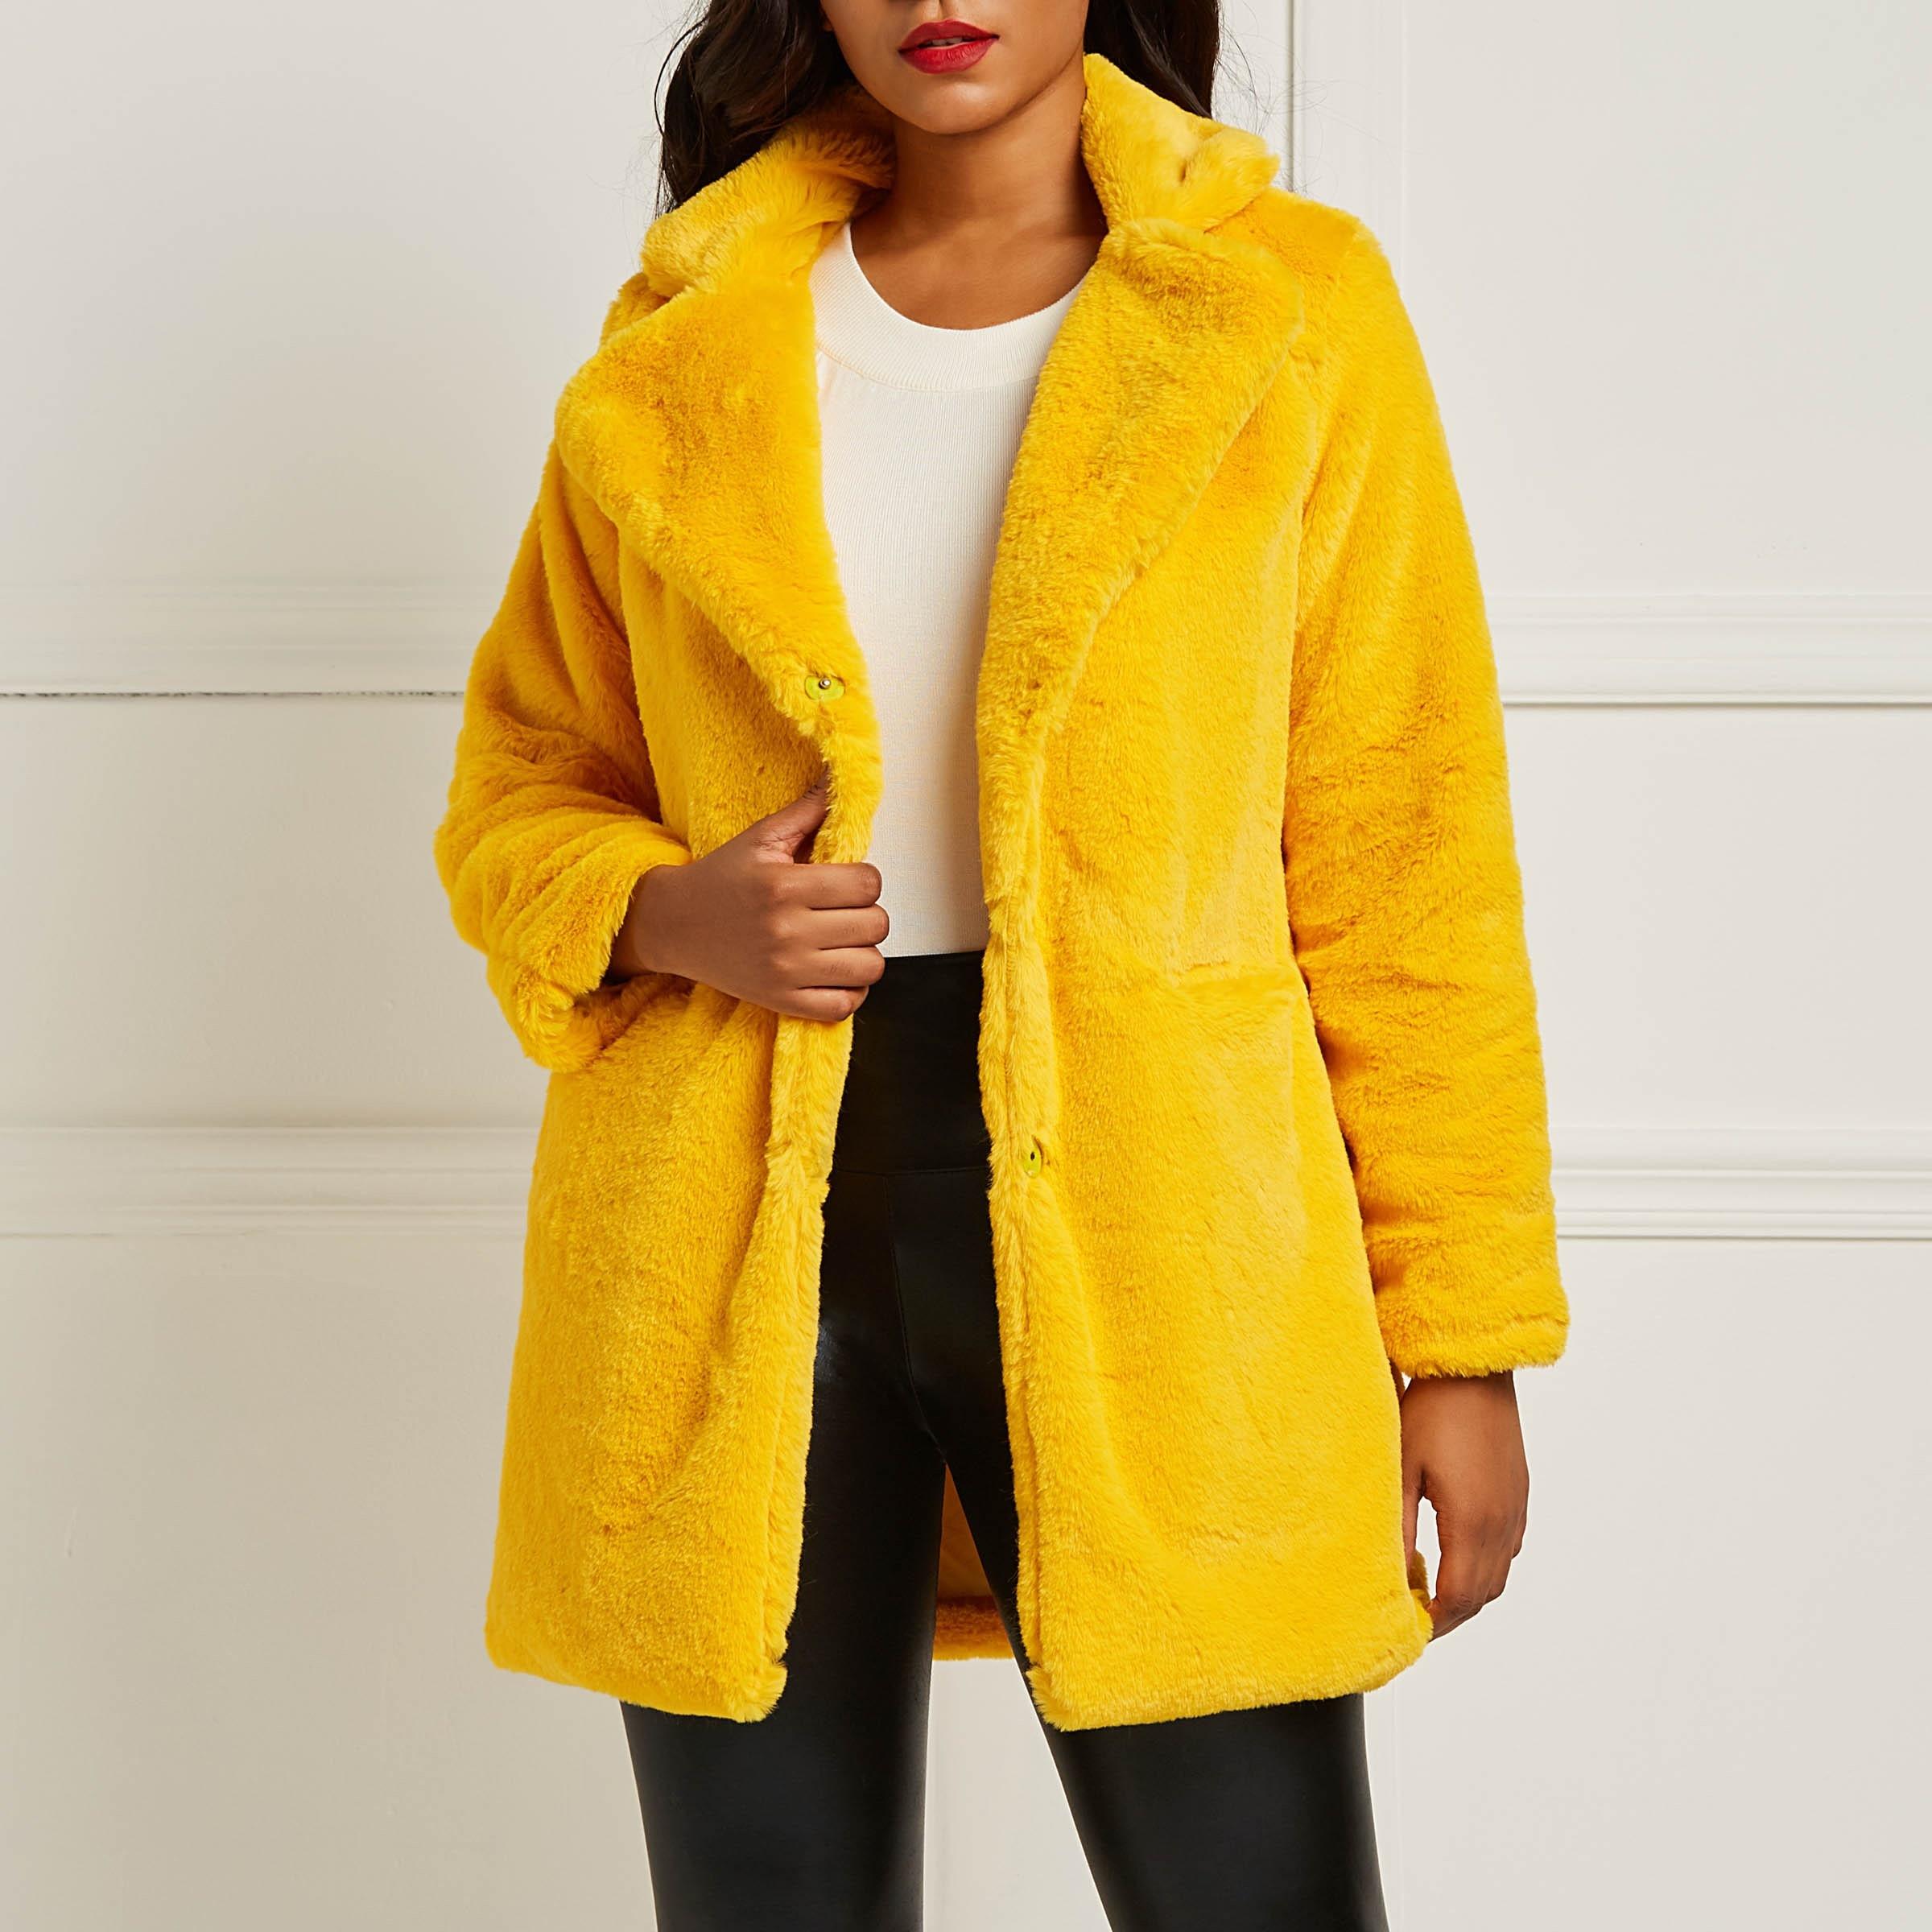 buy clocolor teddy coat plush 2018 winter. Black Bedroom Furniture Sets. Home Design Ideas